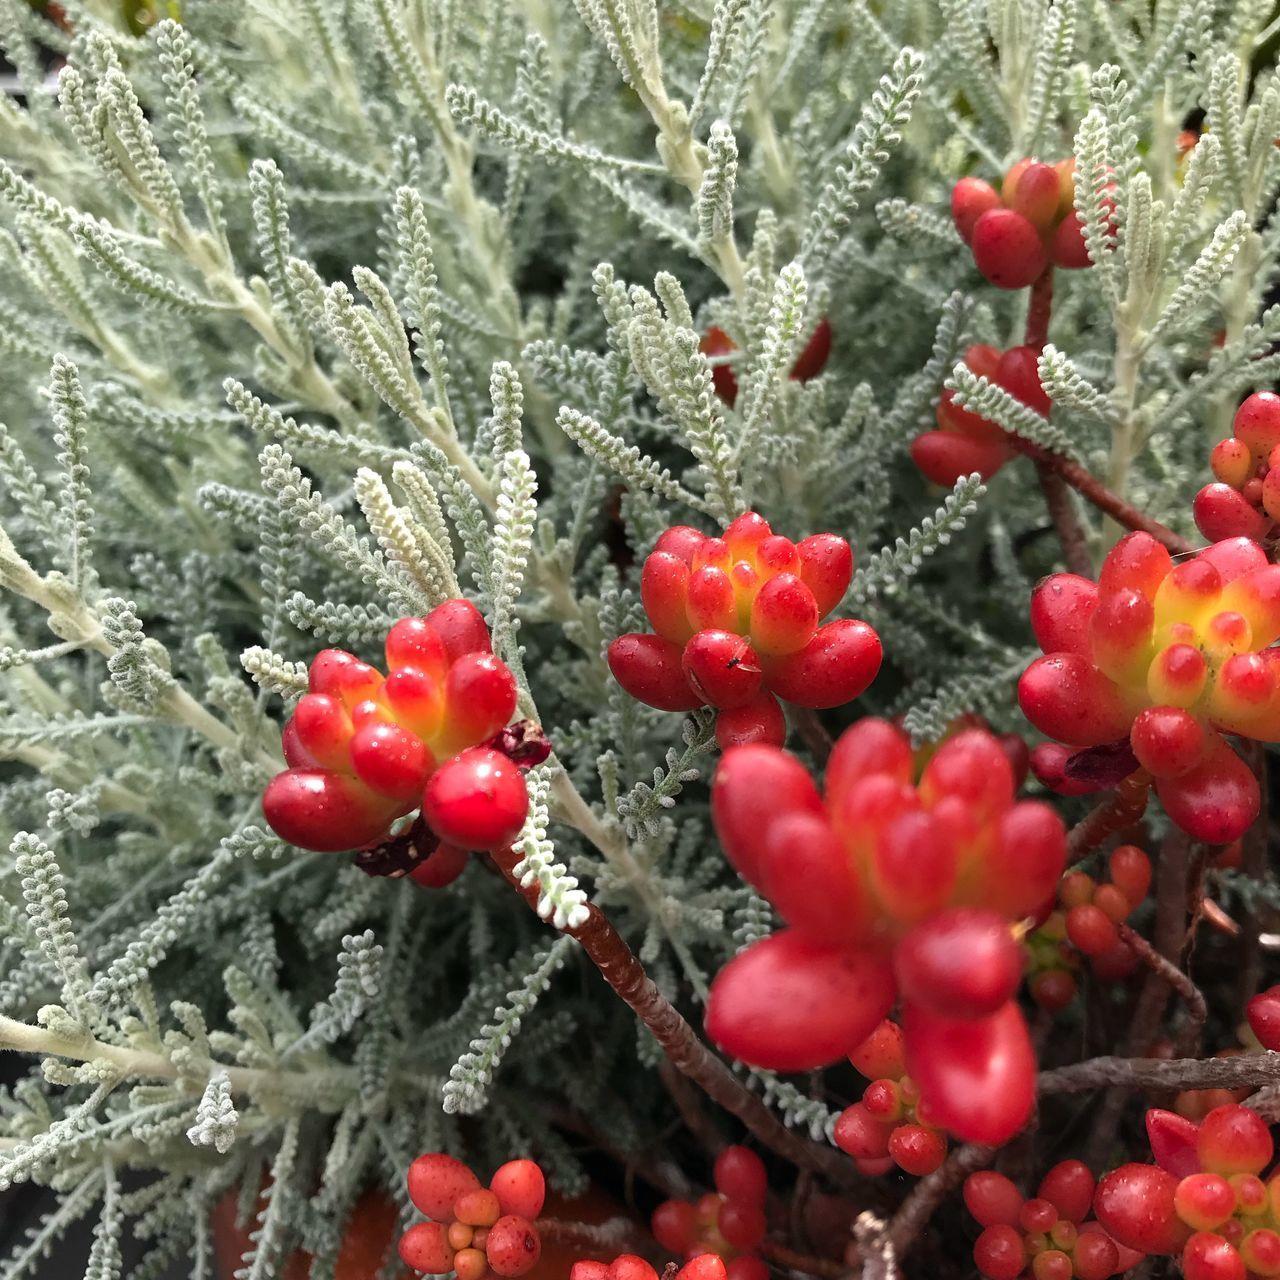 CLOSE-UP OF FROZEN RED BERRIES IN WINTER